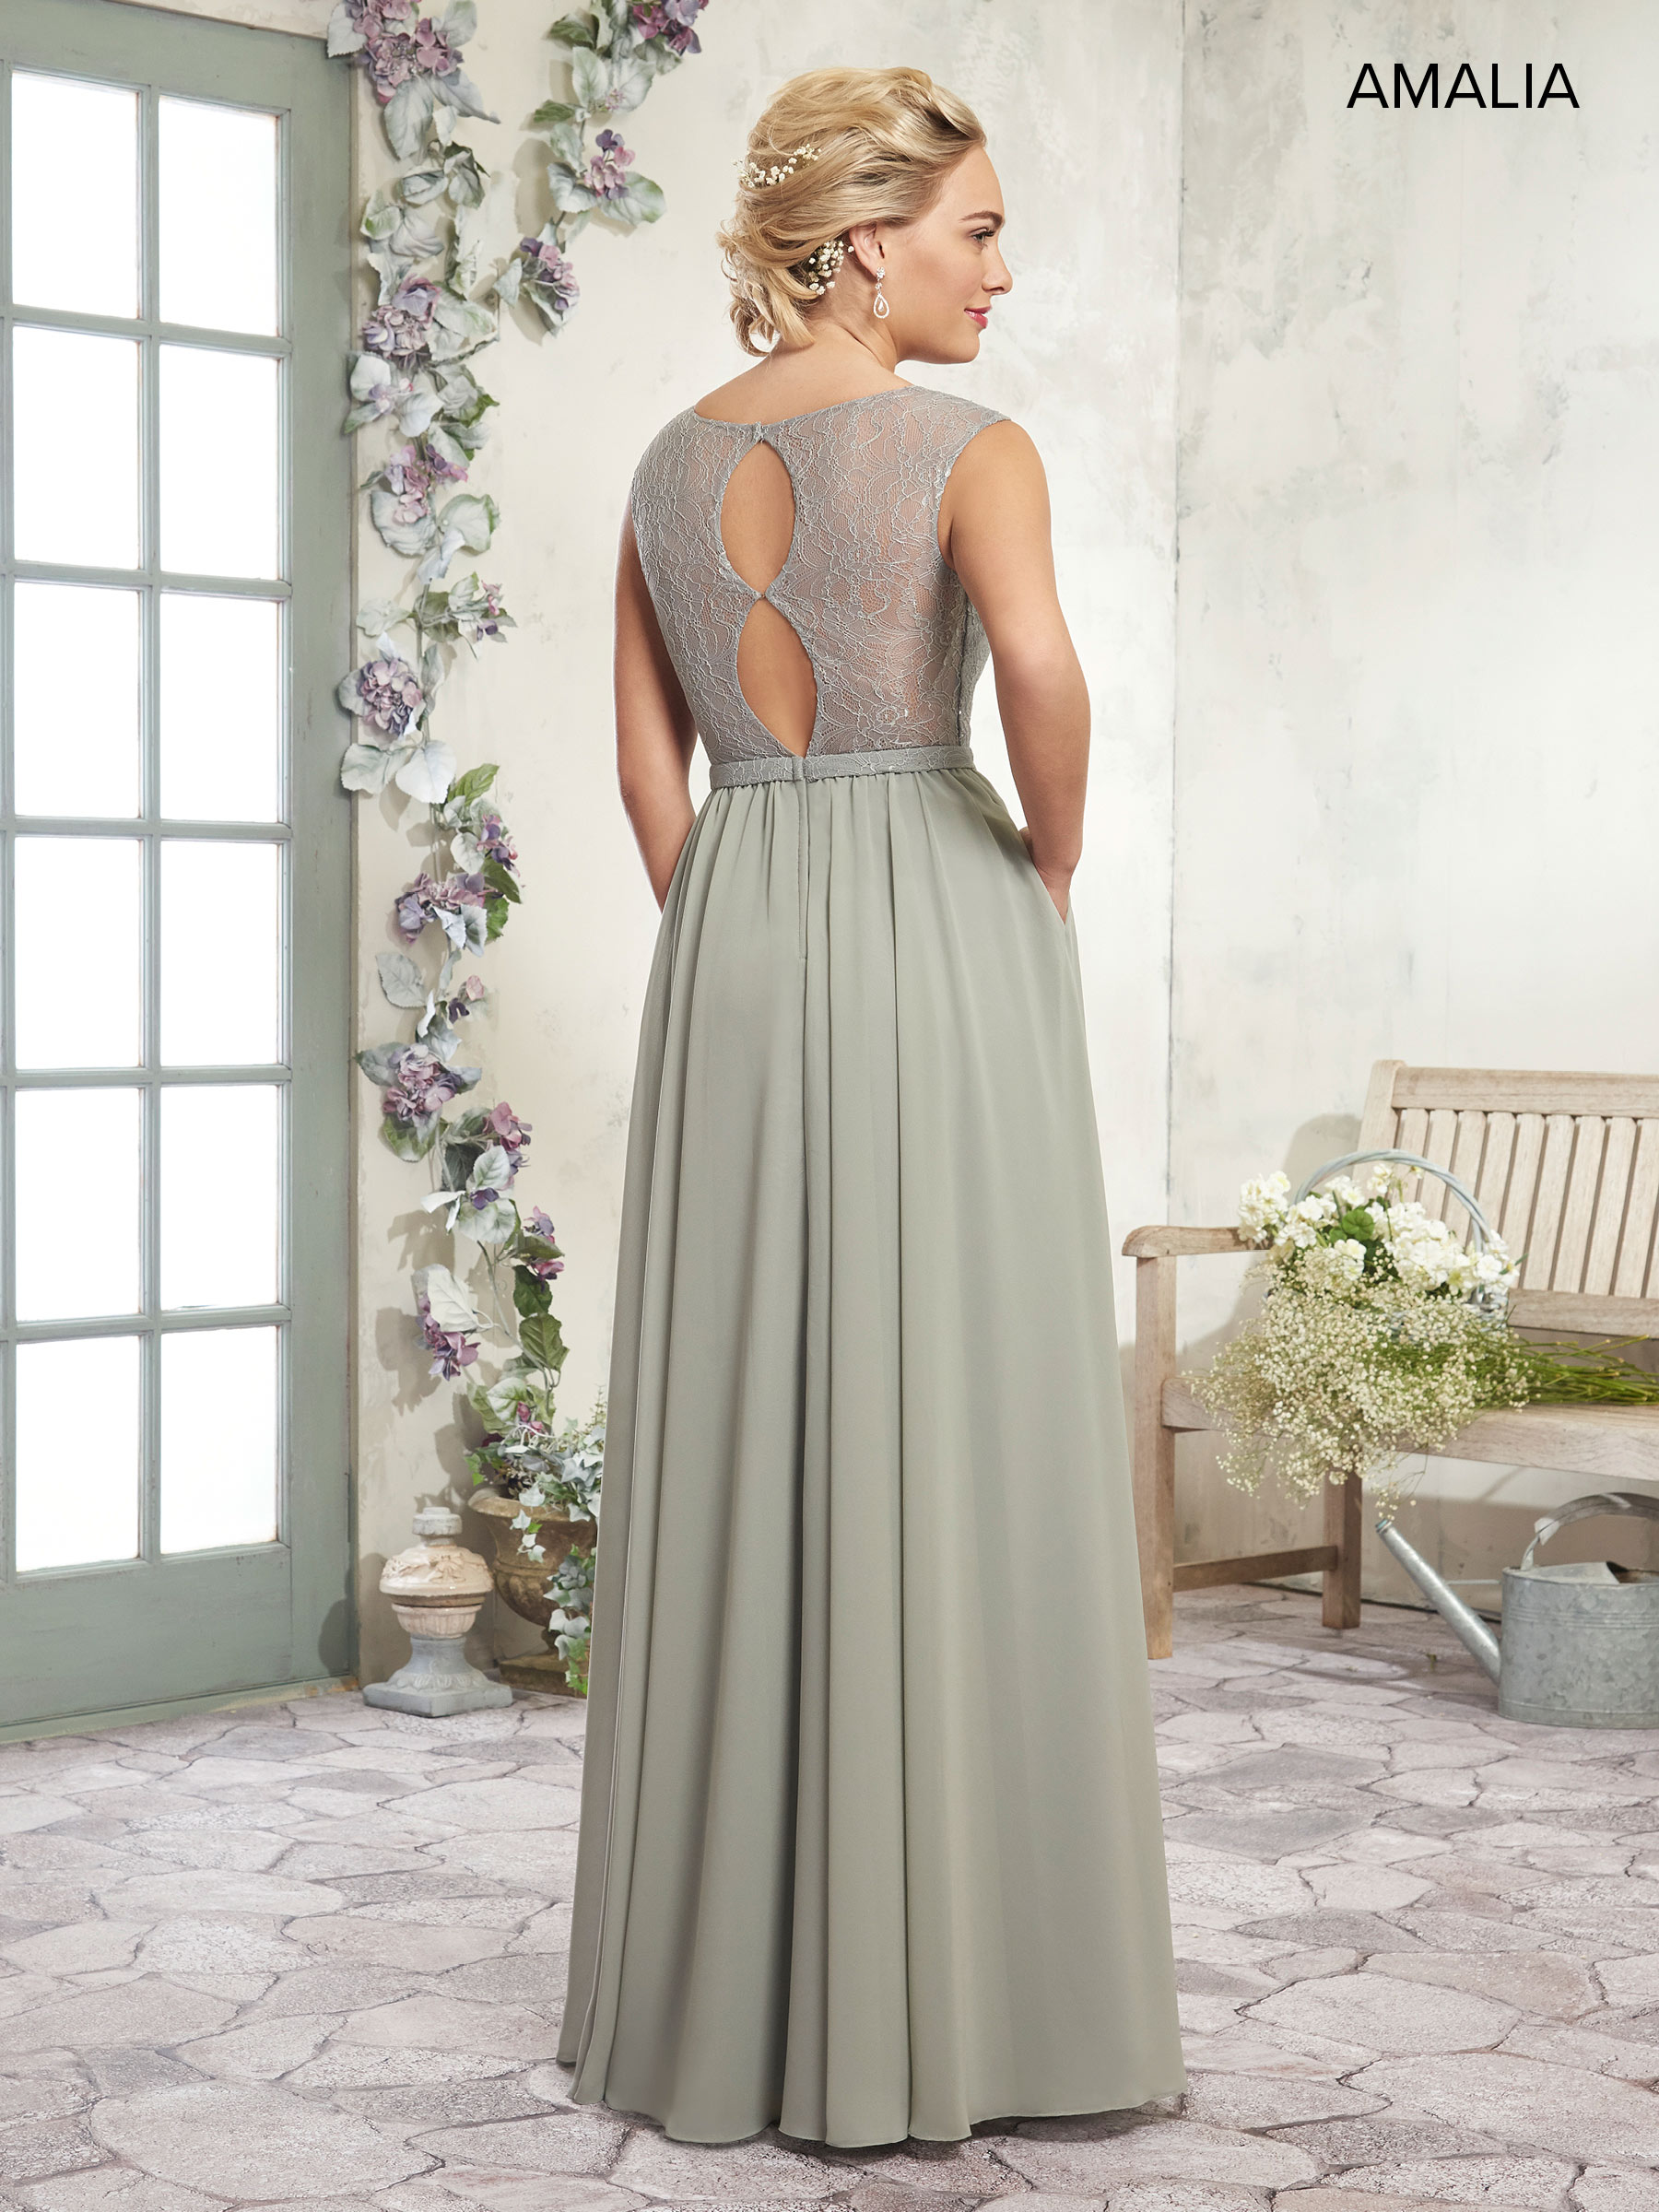 Amalia Bridesmaid Dresses   Amalia   Style - MB7019